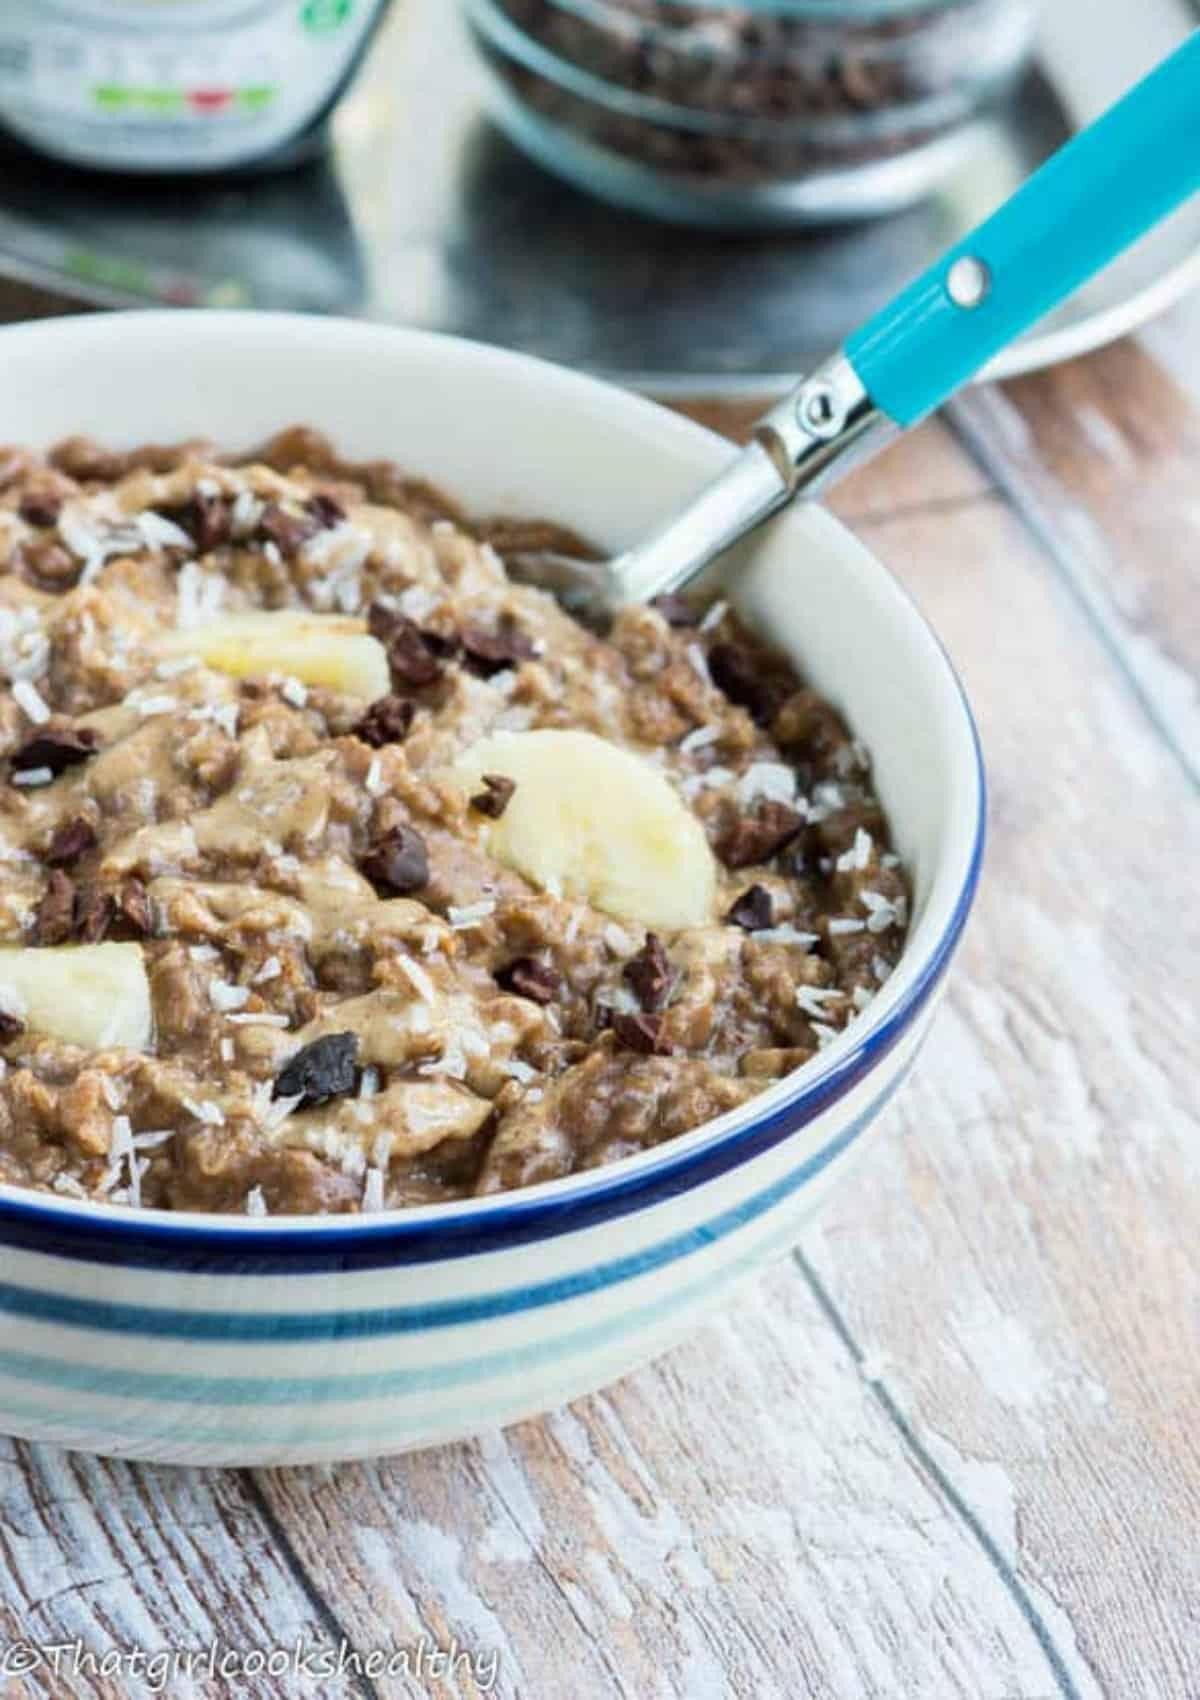 Half a bowl of porridge